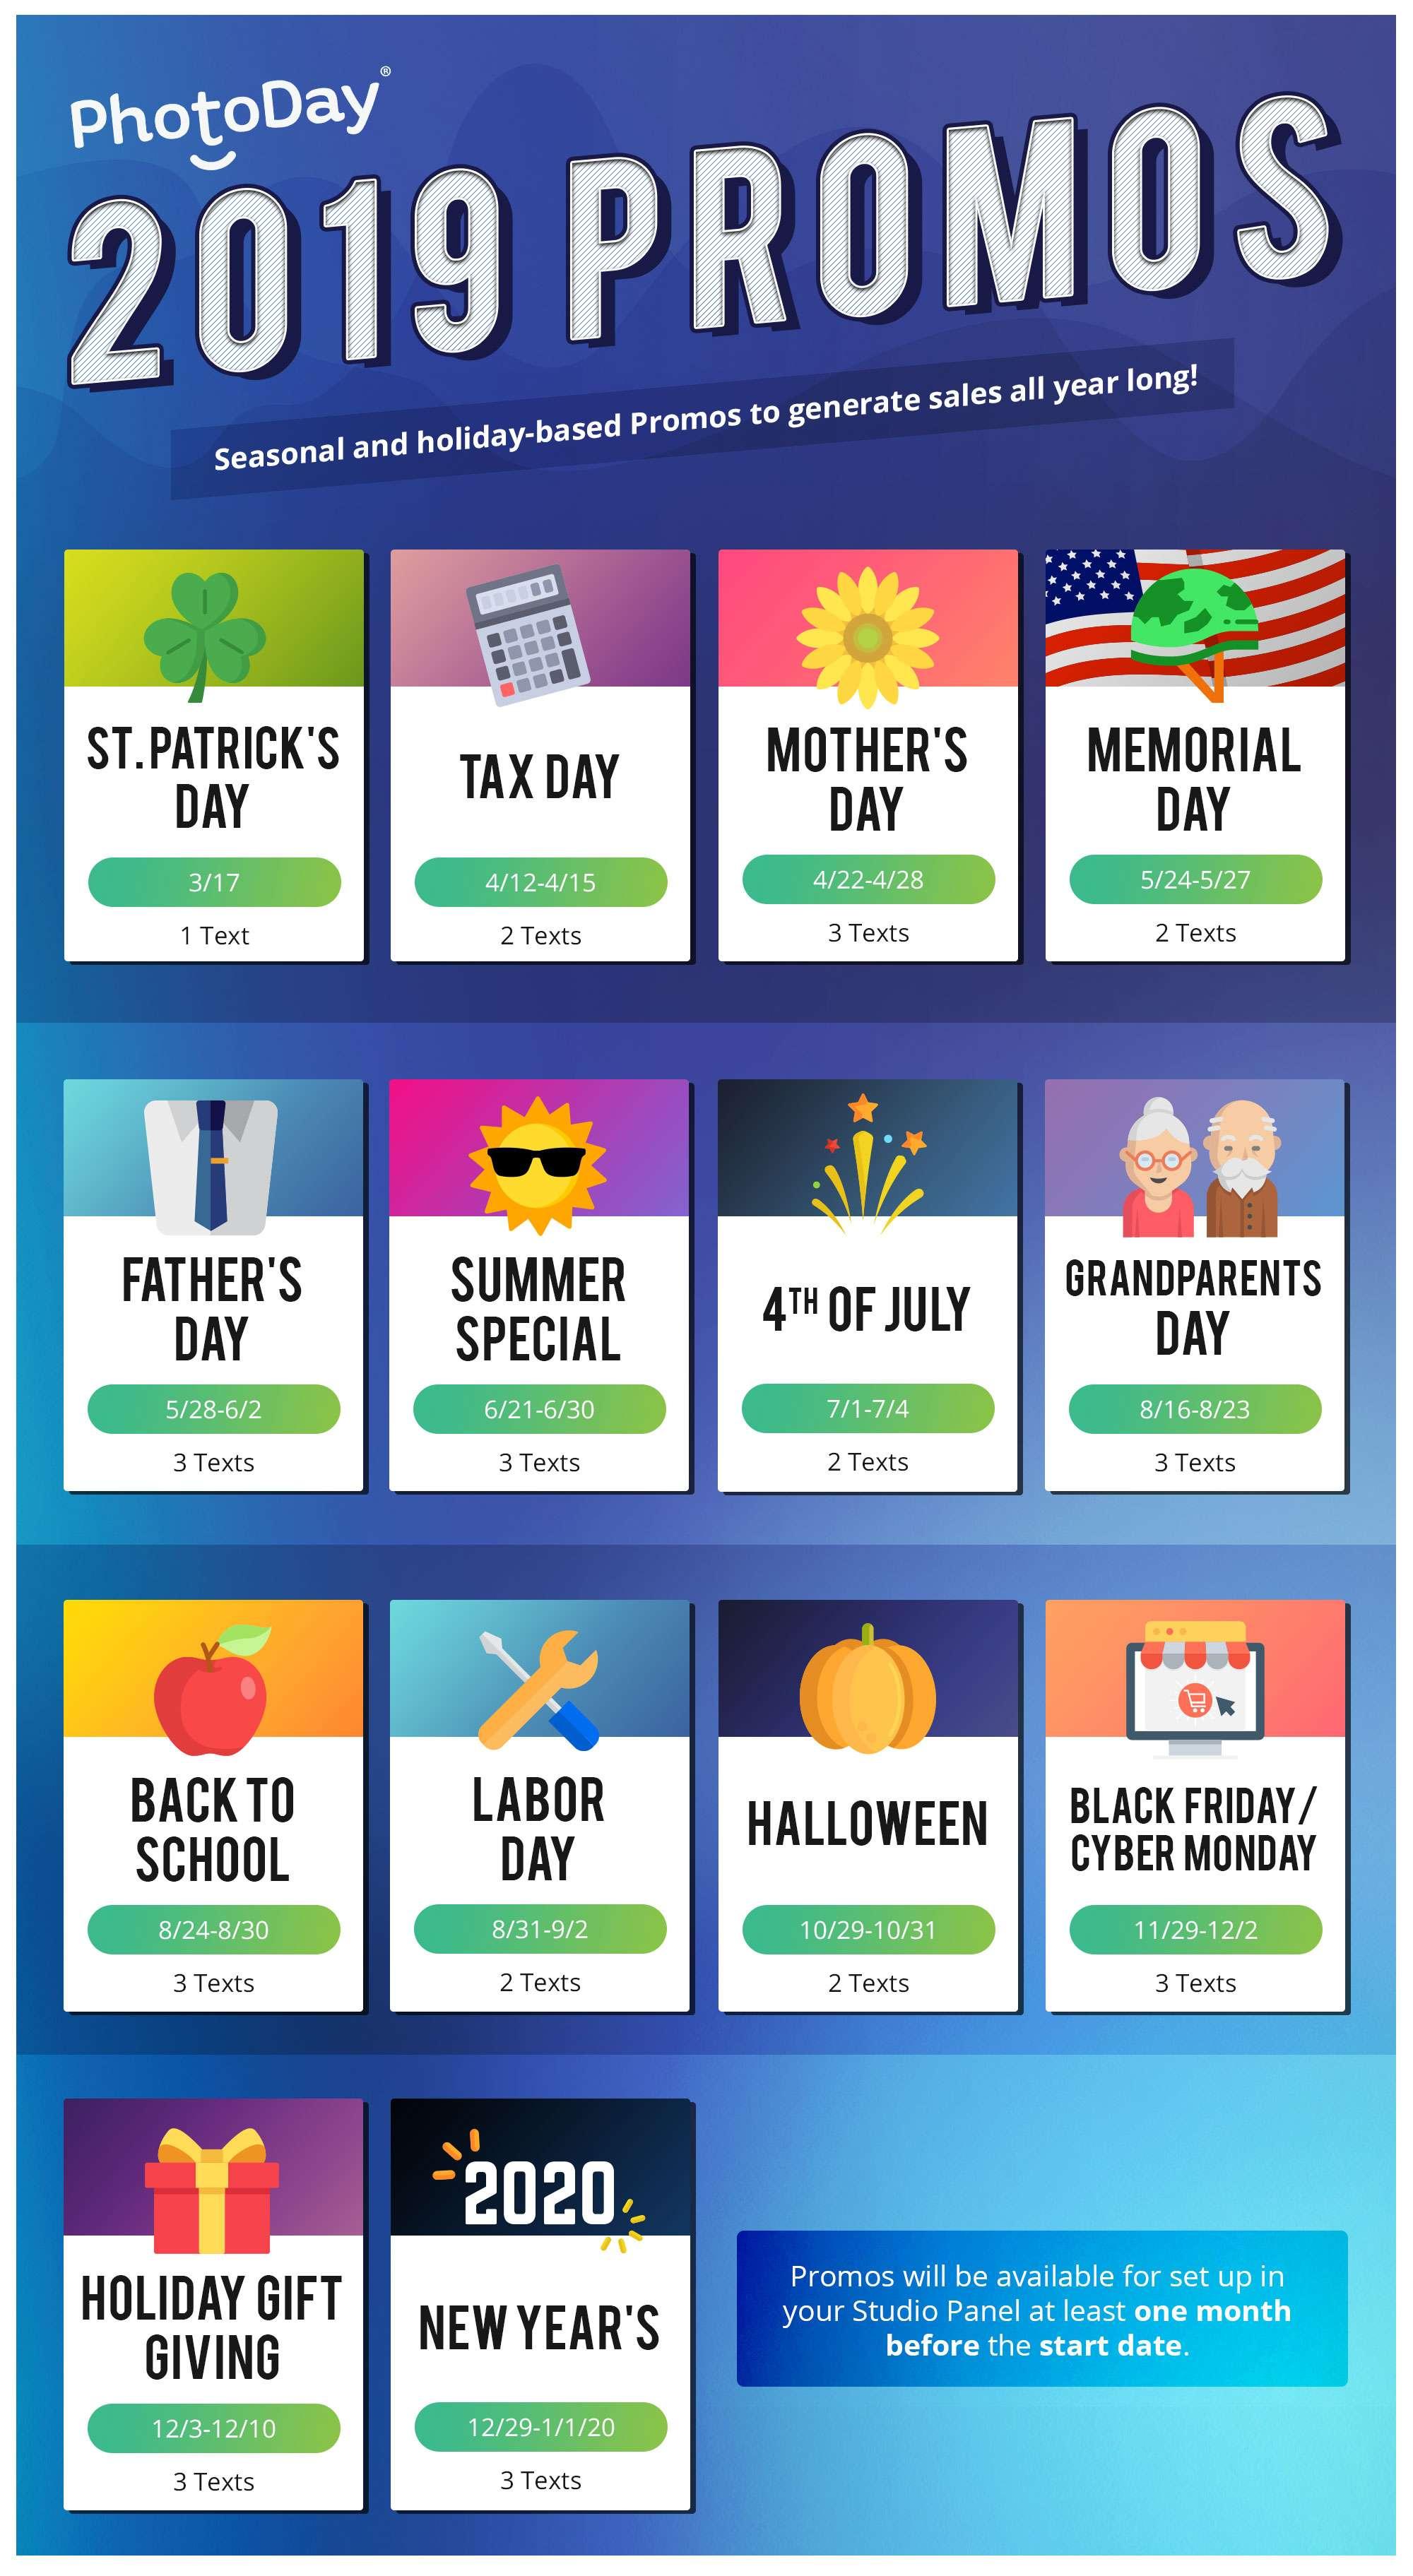 Promos Schedule 2019